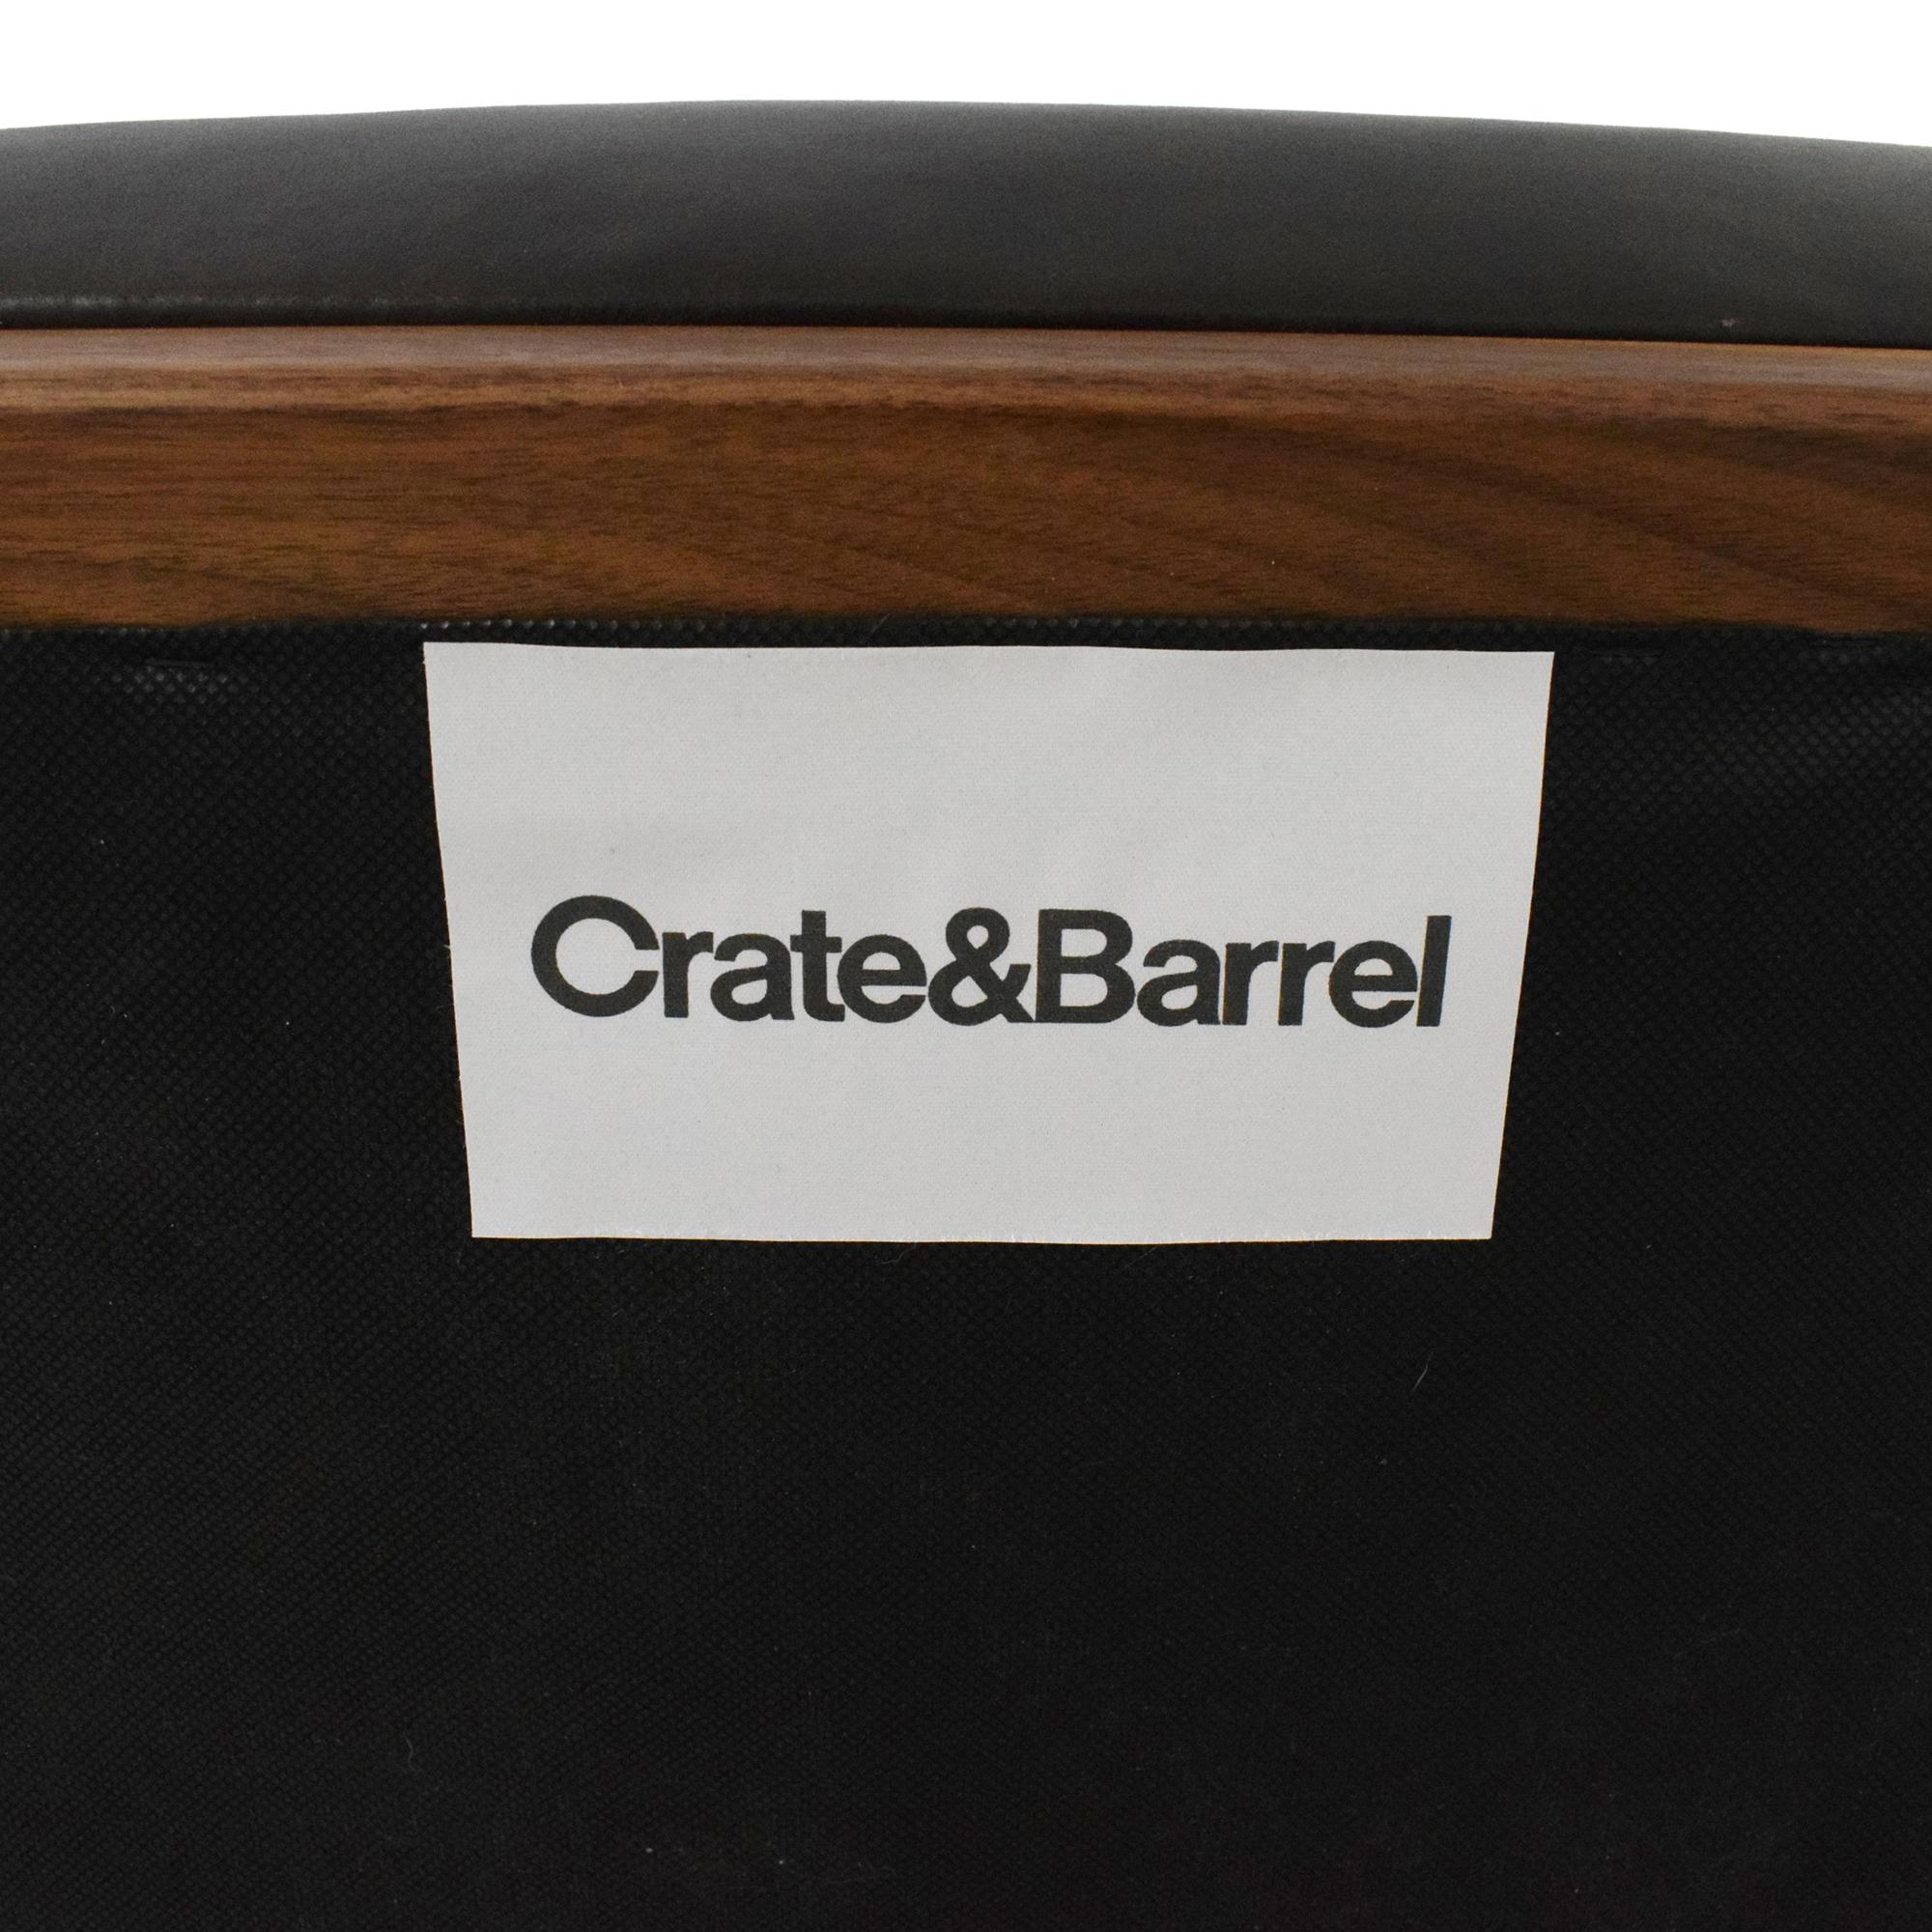 Crate & Barrel Crate & Barrel Cavett Upholstered Bench coupon